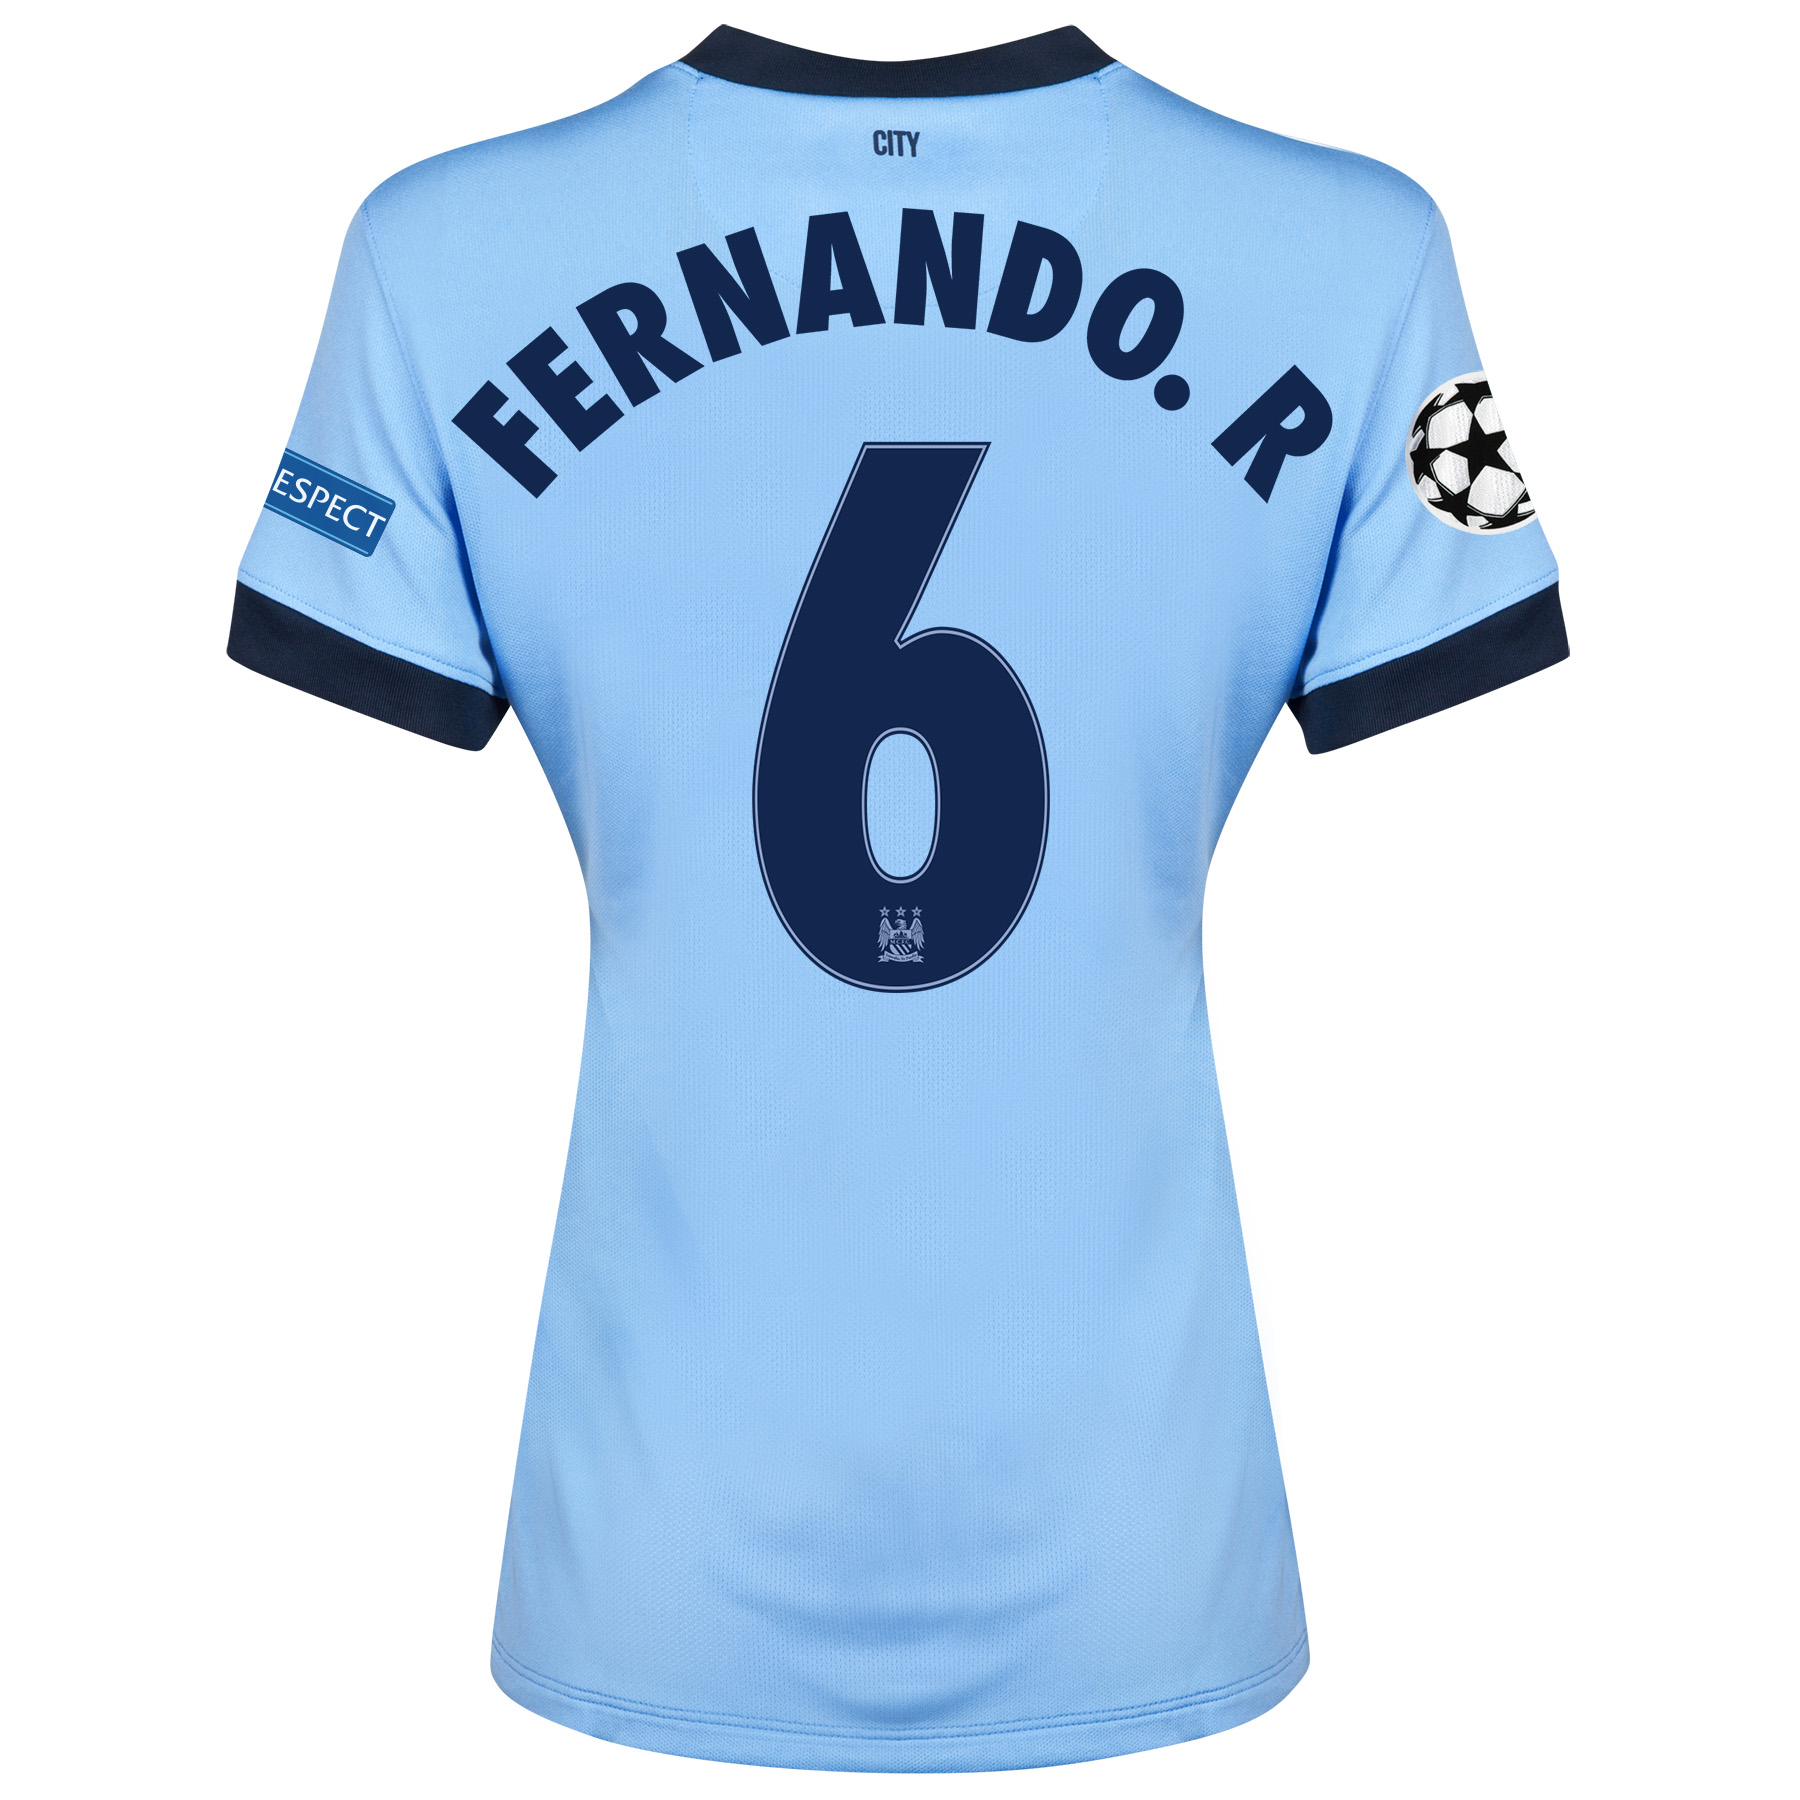 Manchester City UEFA Champions League Home Shirt 2014/15 - Womens Sky Blue with Fernando. R 6 printing